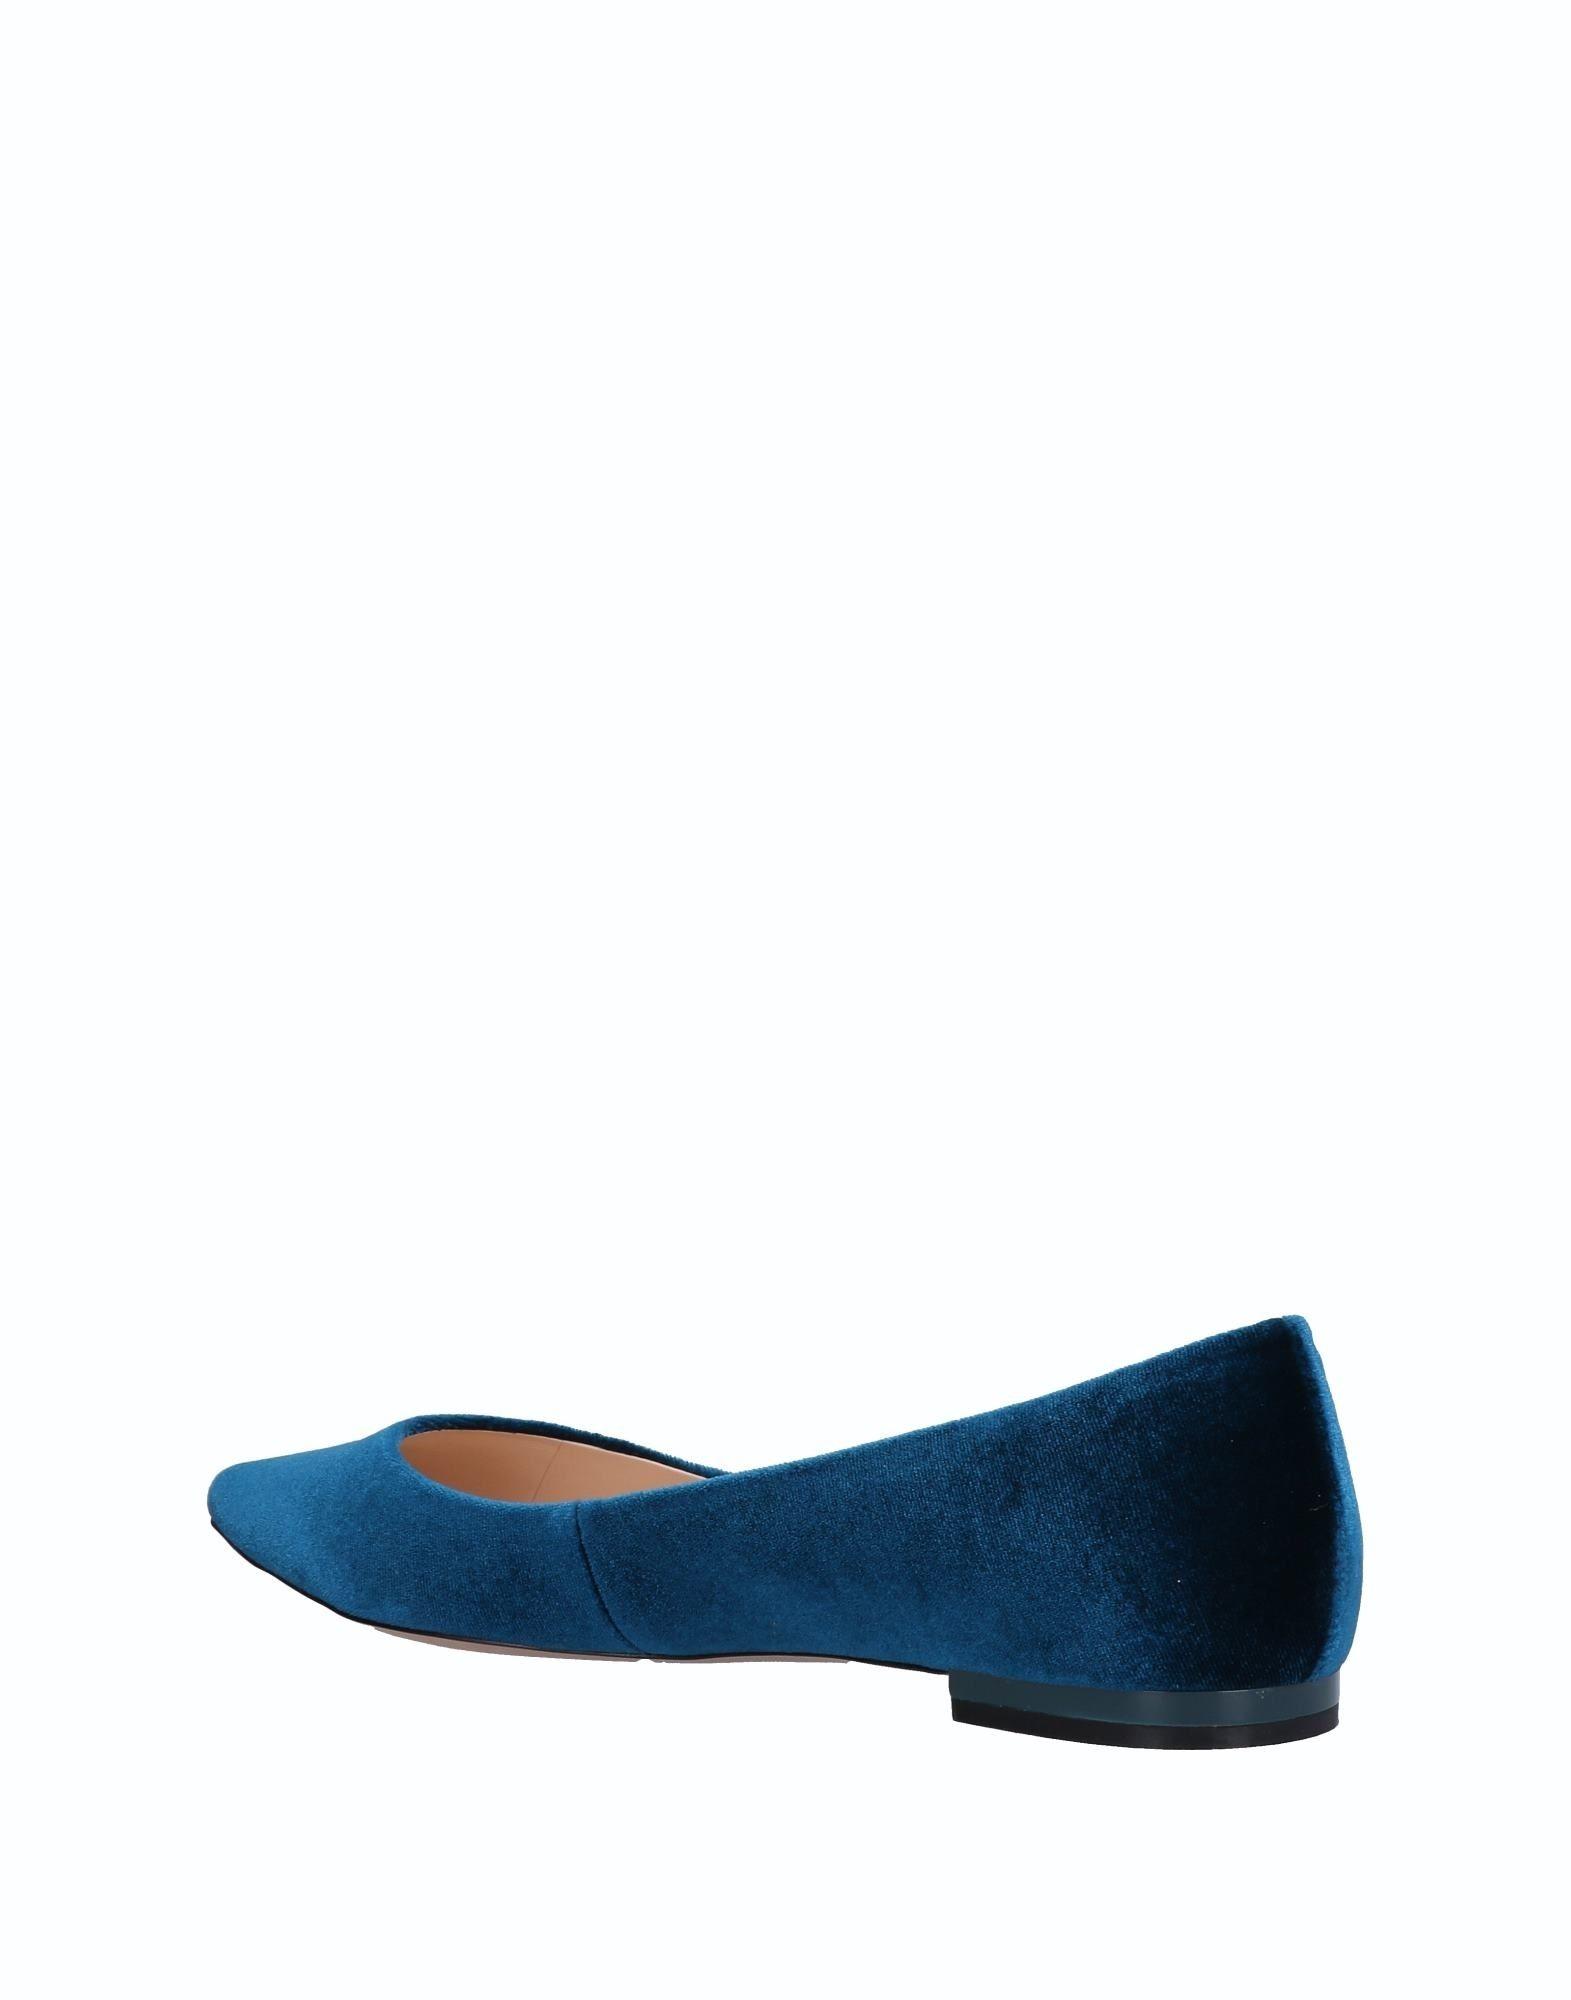 Gut um Pazolini billige Schuhe zu tragenCarlo Pazolini um Ballerinas Damen  11510379DP 8f9ce4